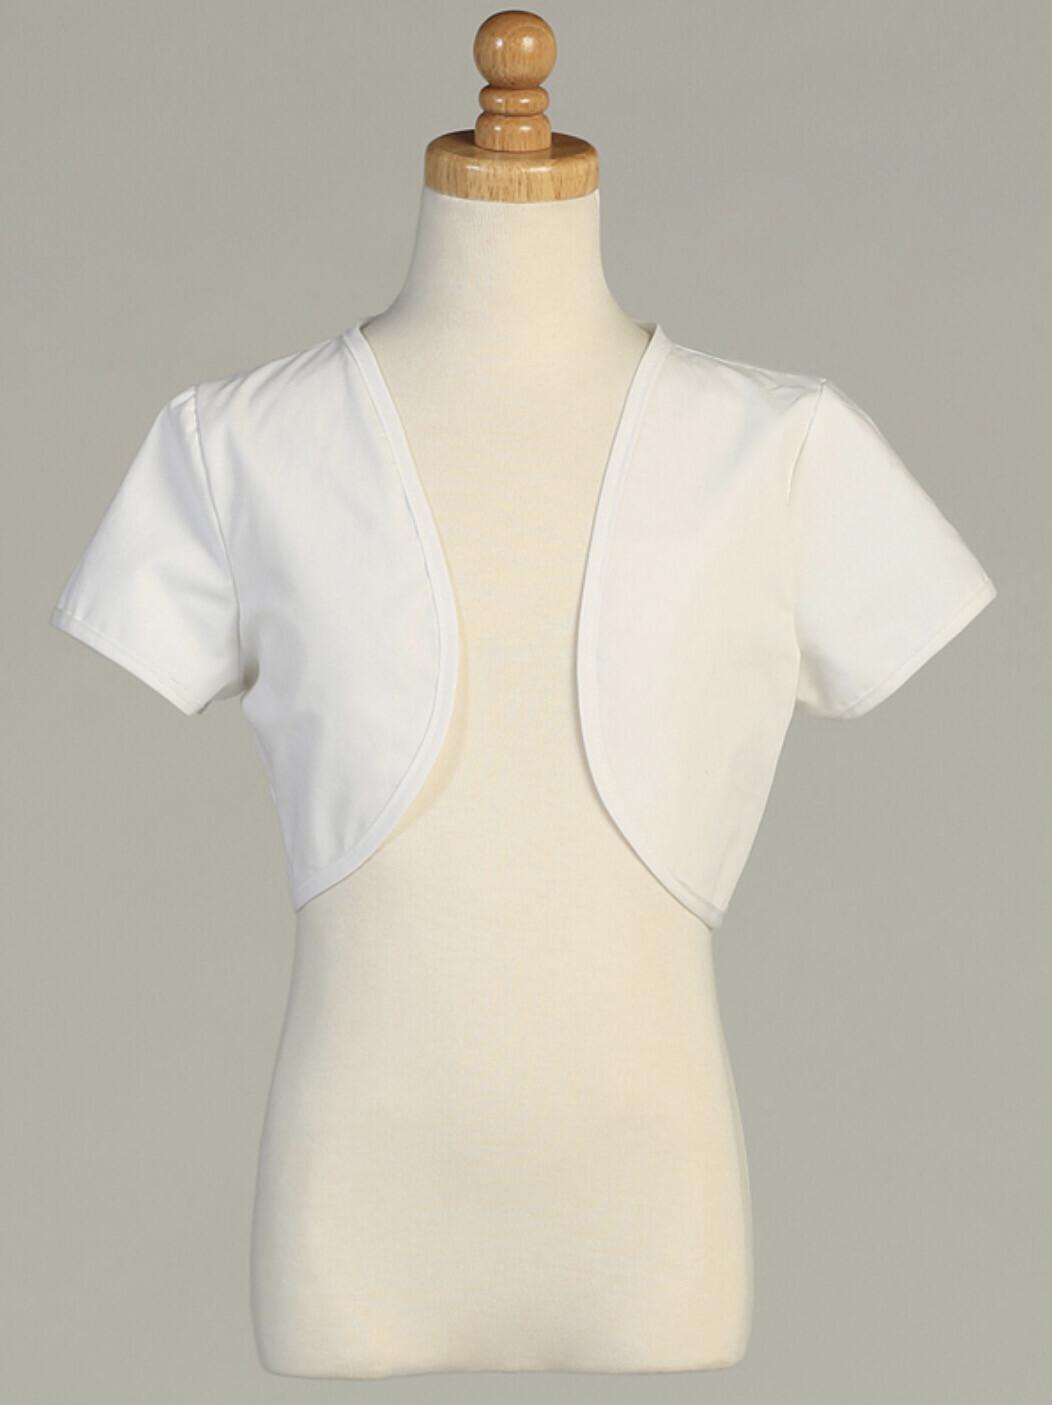 White Bolero Short Sleeves